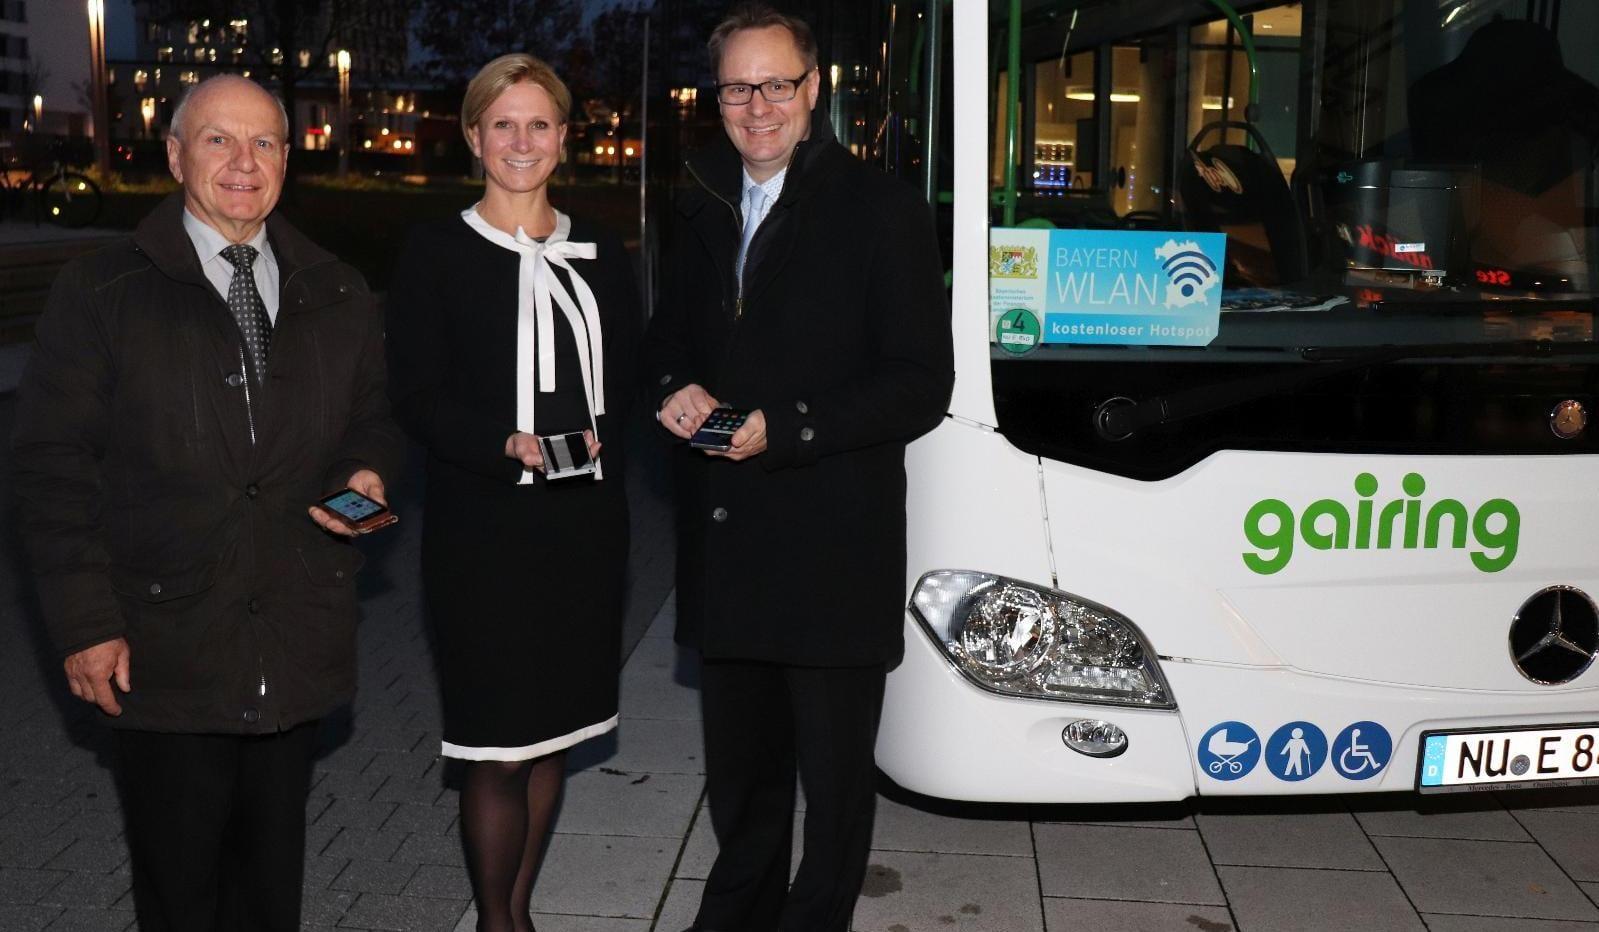 WLAN in Gairing-Linienbussen_Junginger, Schnarrenberger, Freudenberger